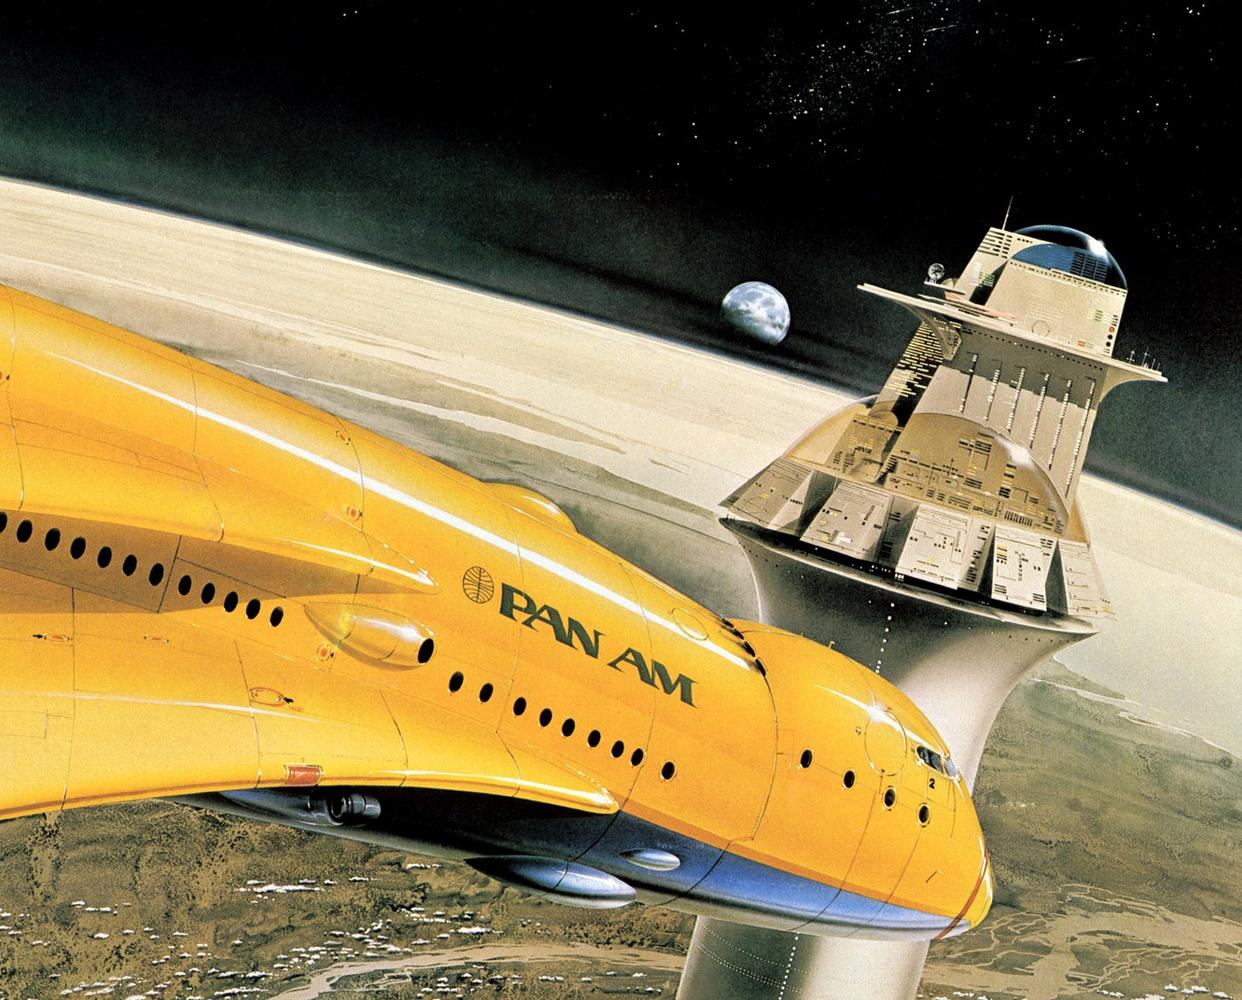 Le Blog de Jerry Frissen - illustration Wayne Barlowe Expedition 2